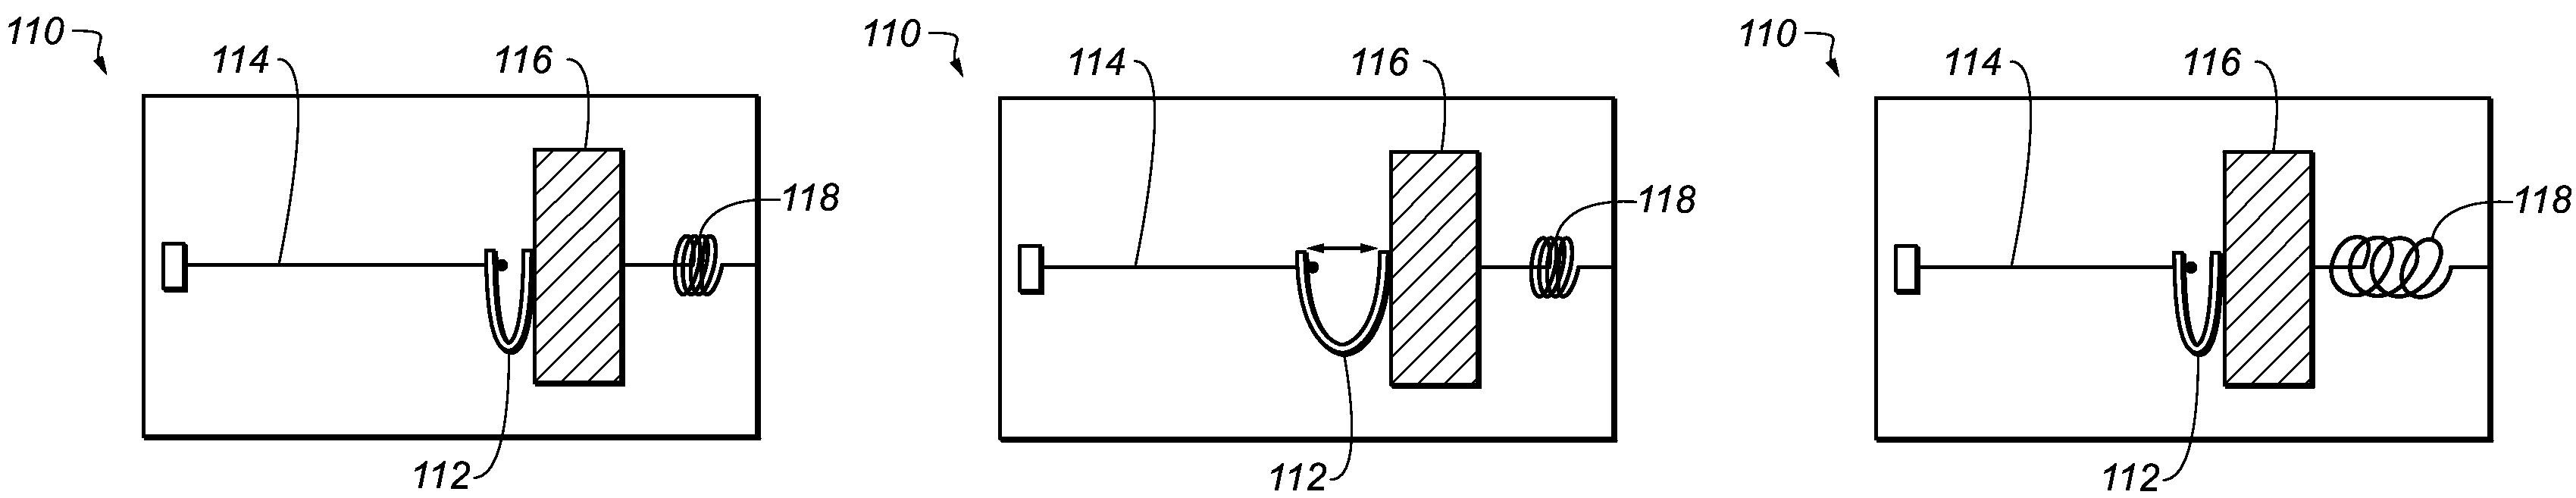 Apple patent dual haptic feedback drawing 001